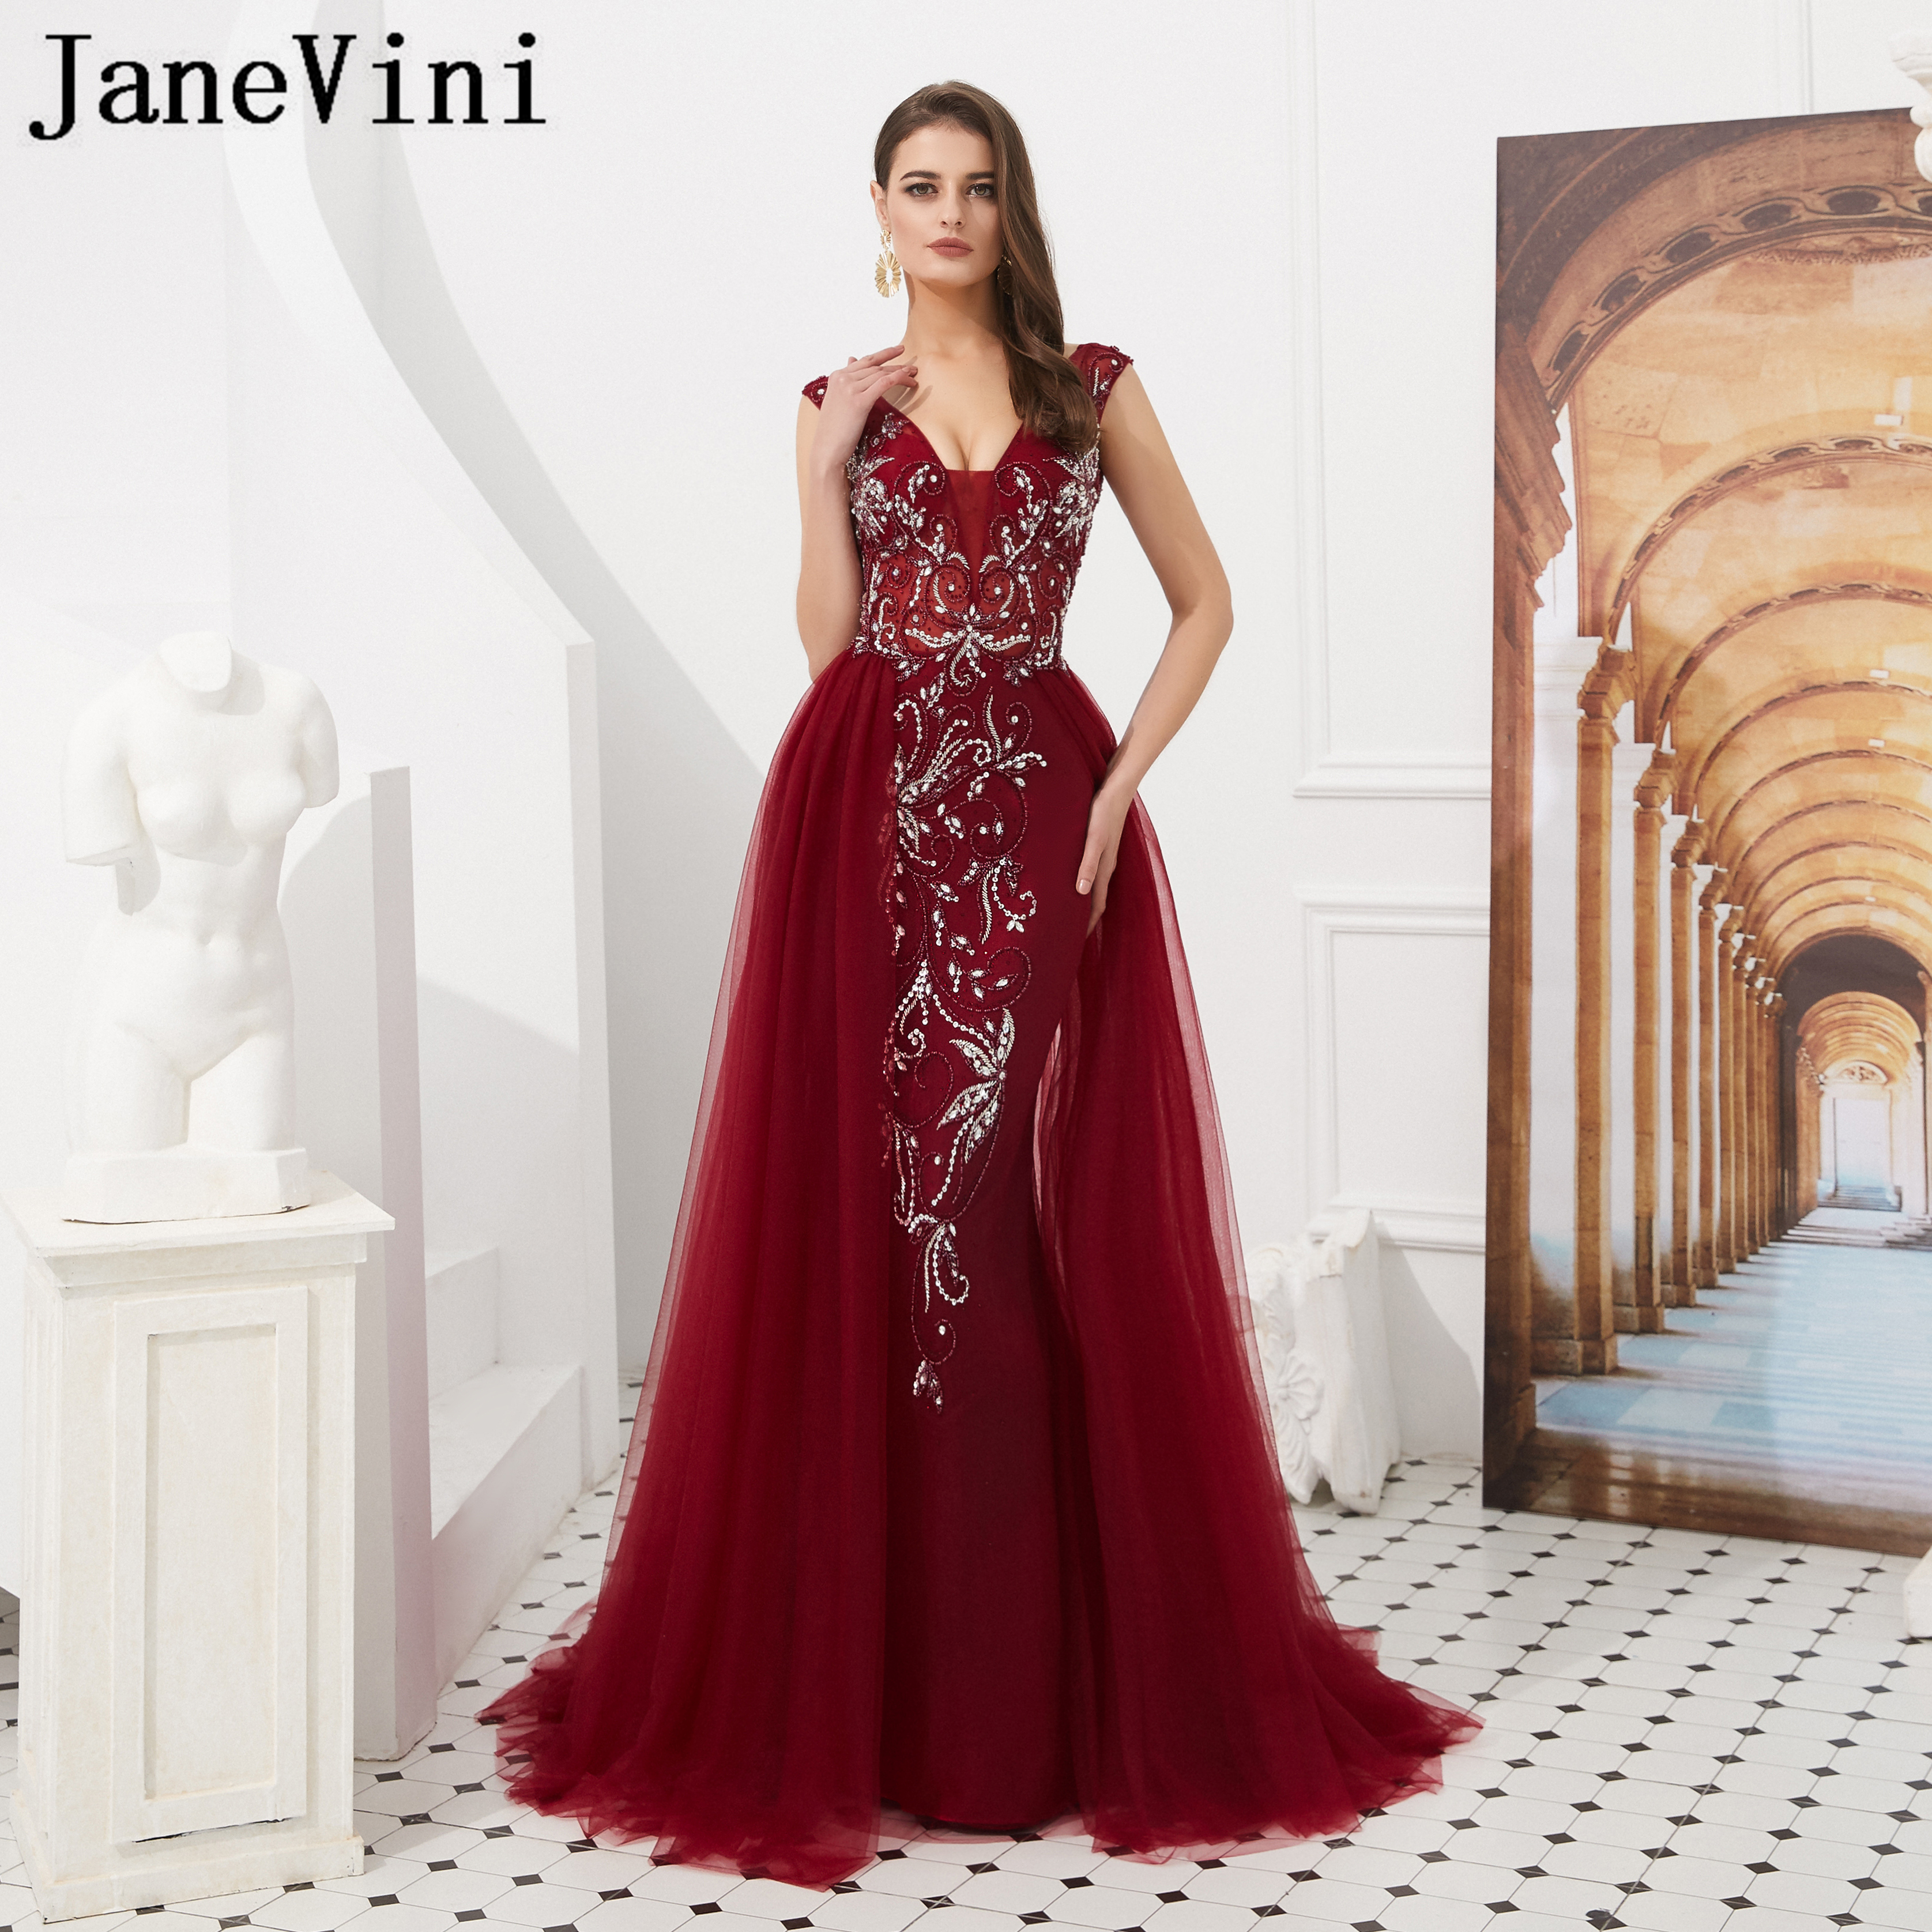 fb77504a5b JaneVini Rose Gold Sequined Bridesmaid Dresses Long Short Sleeve ...